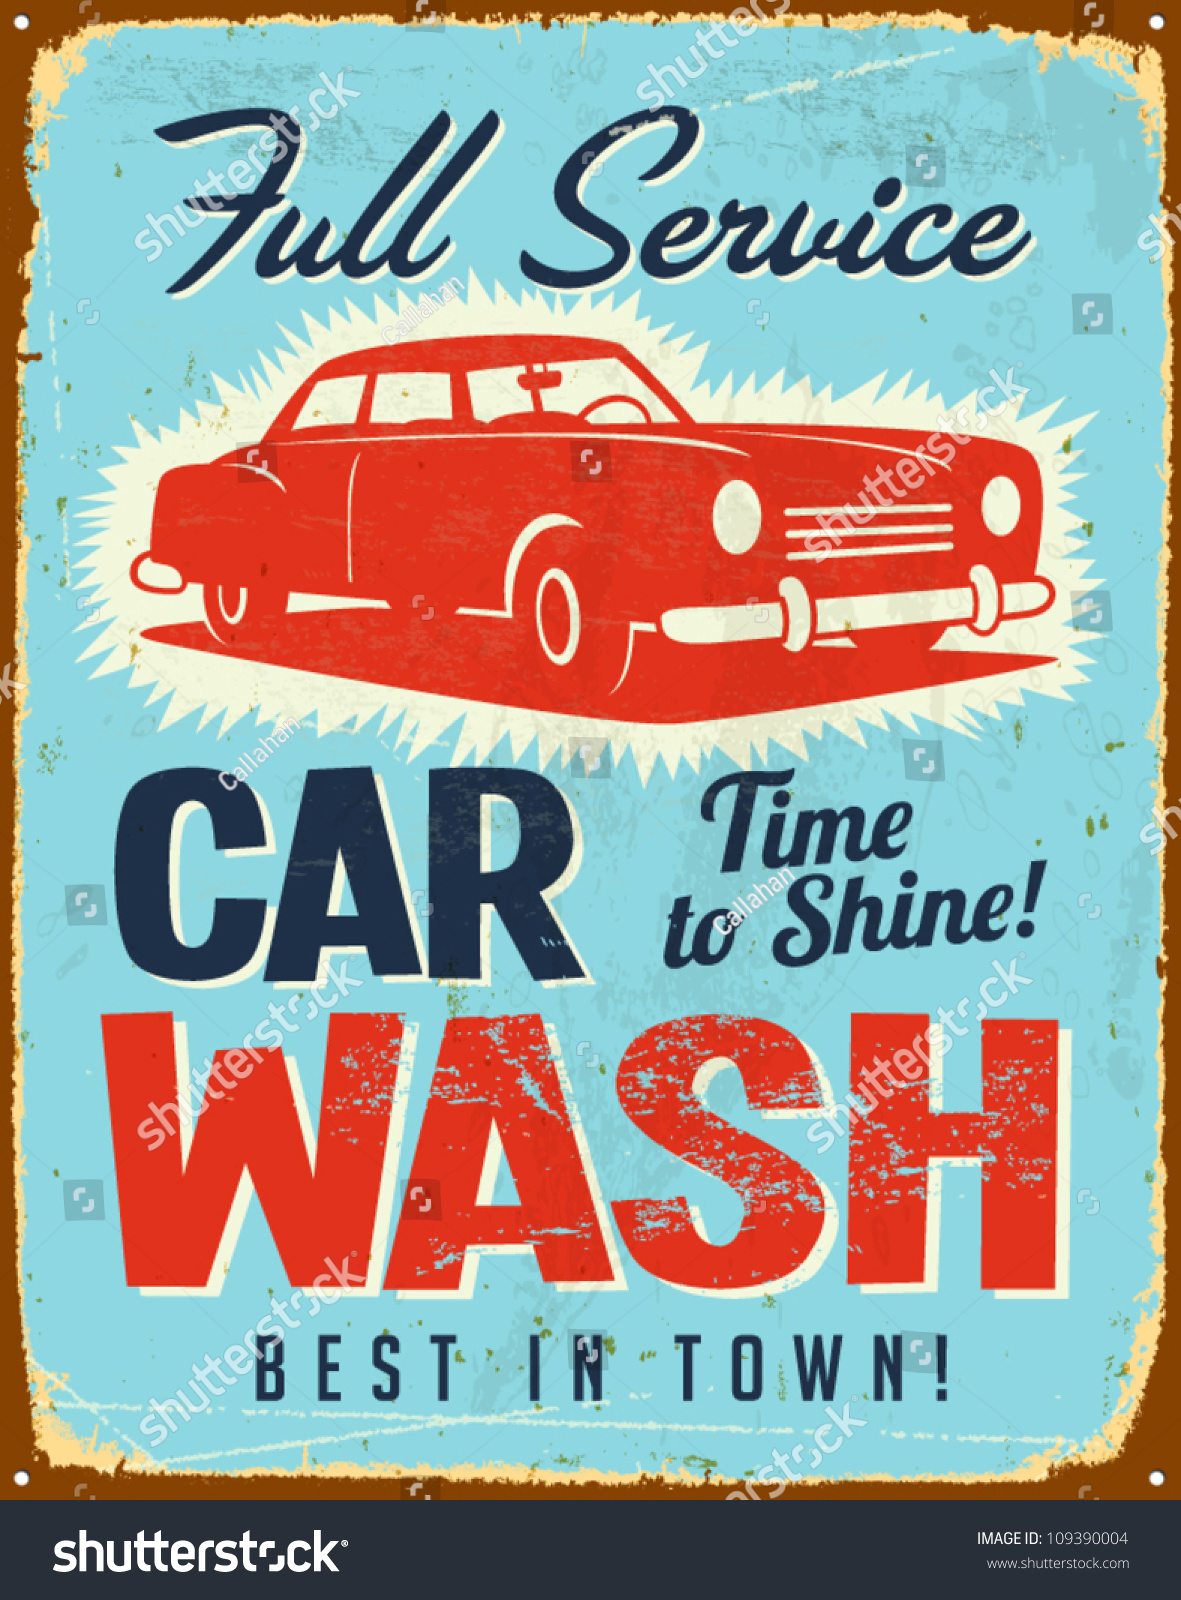 Tss Car Wash Site Youtube Com